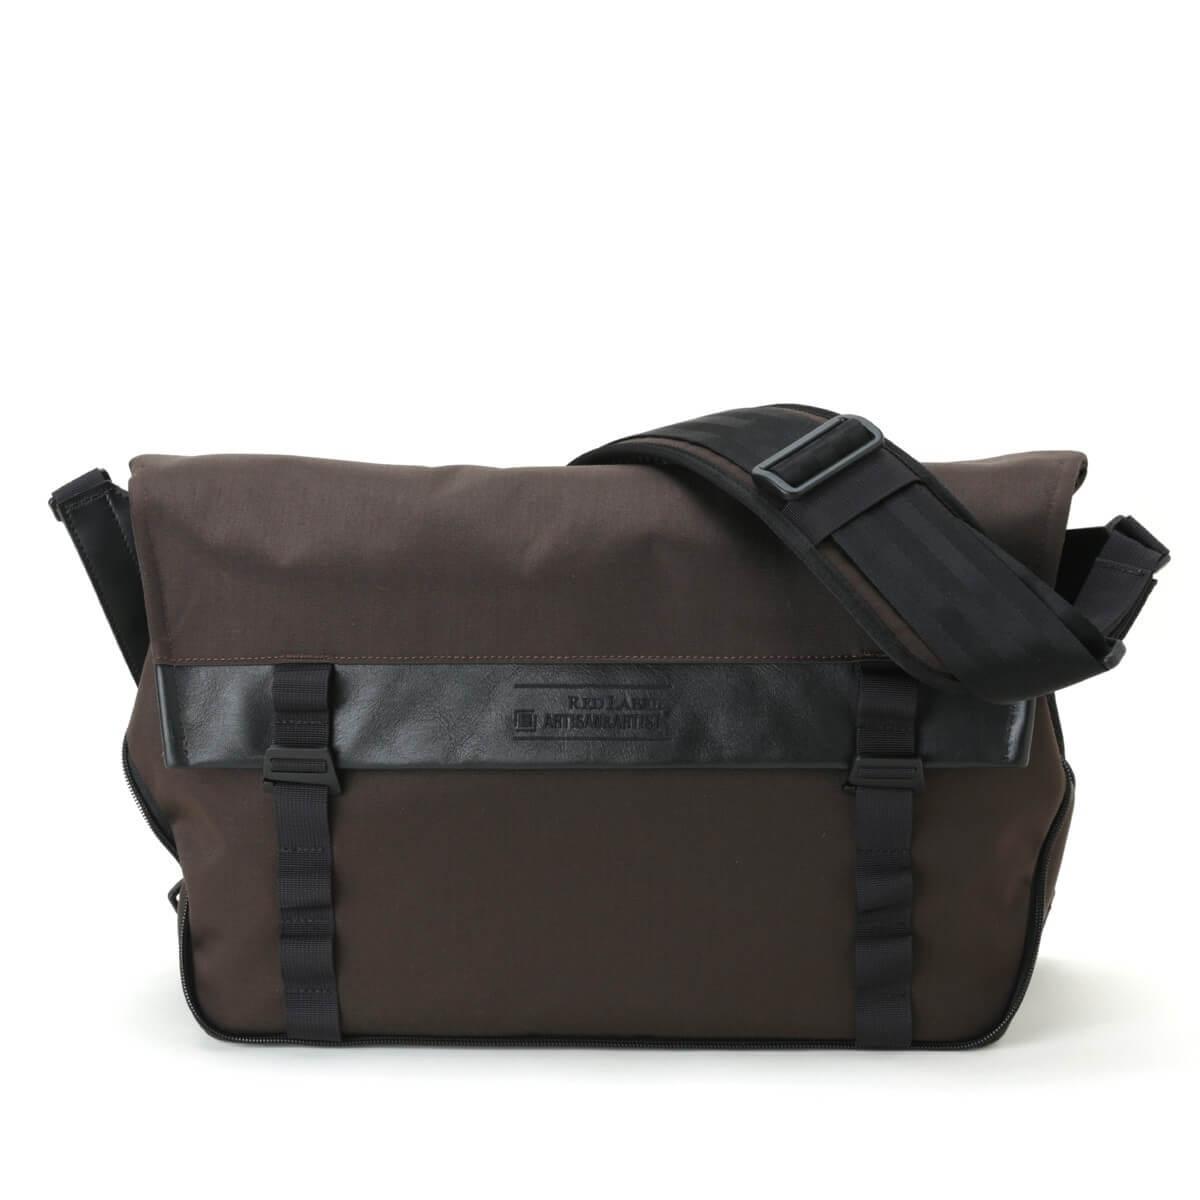 Artisan Artist RDB MG300 Messenger Bag 3